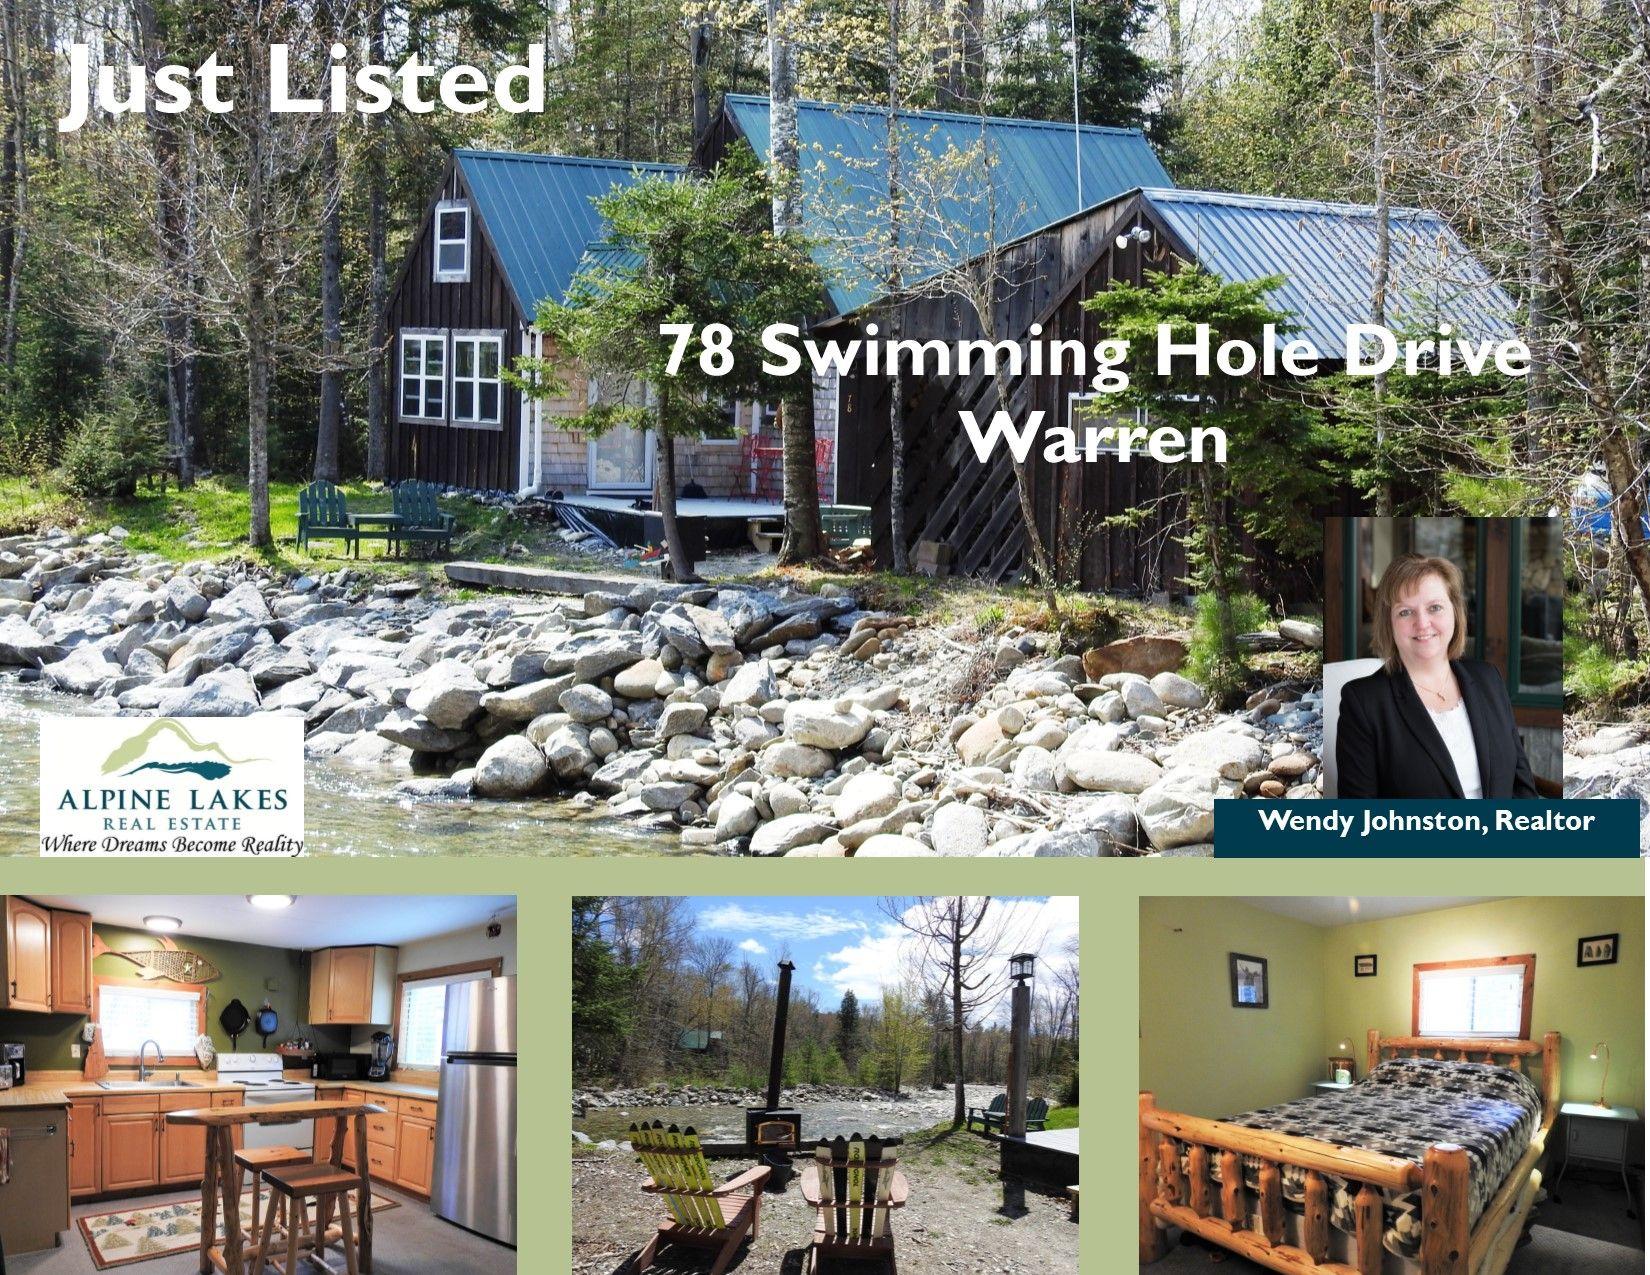 78 Swimming Hill Drive Warren Nh 03279 Alpine Lakes Real Estate Lake Real Estate England Real Estate Vacation Home